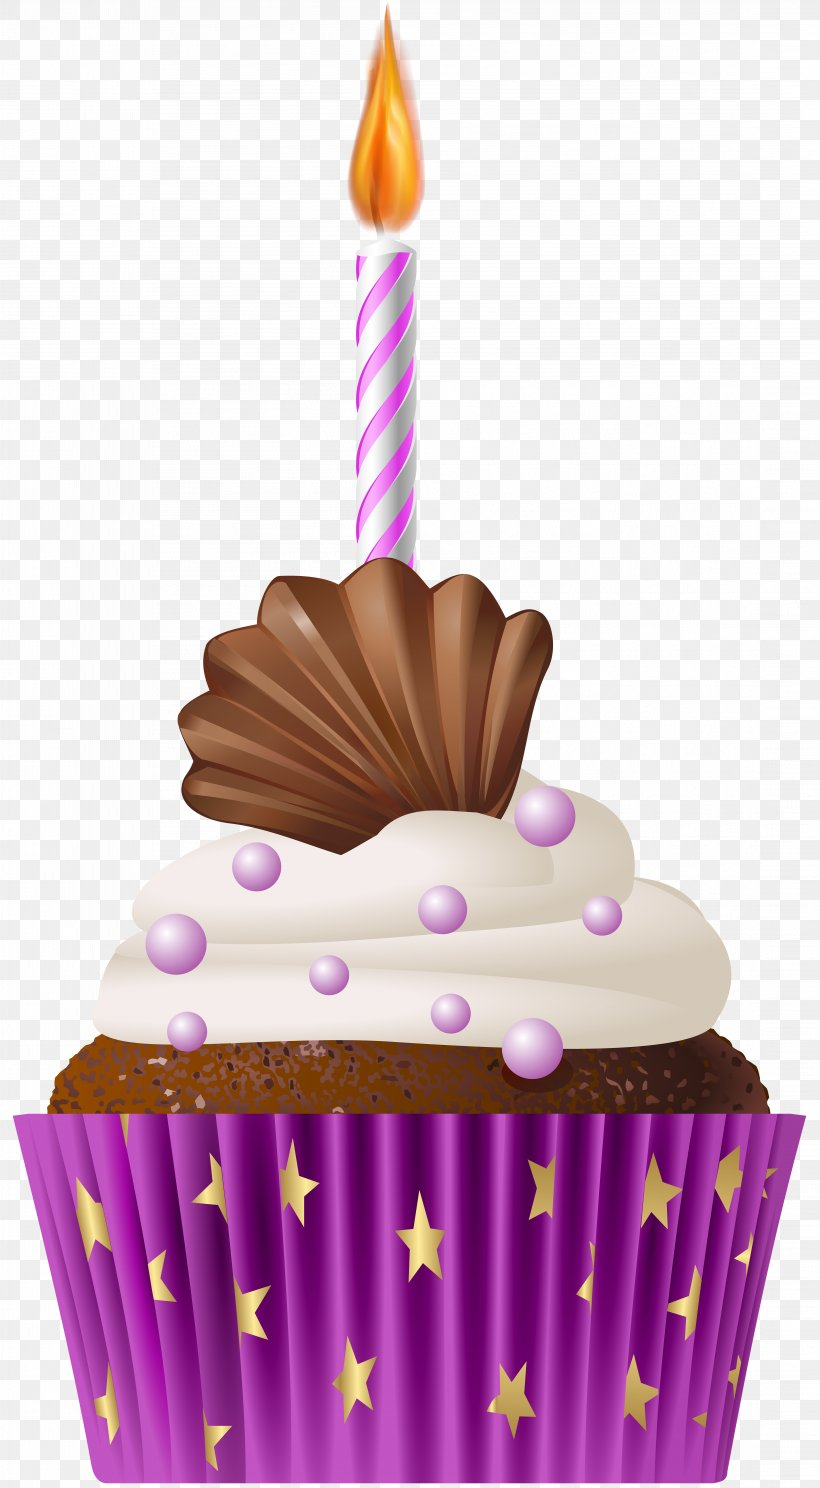 Muffin Cupcake Birthday Cake Clip Art, PNG, 4407x8000px, Birthday Cake, Baking, Birthday, Buttercream, Cake Download Free